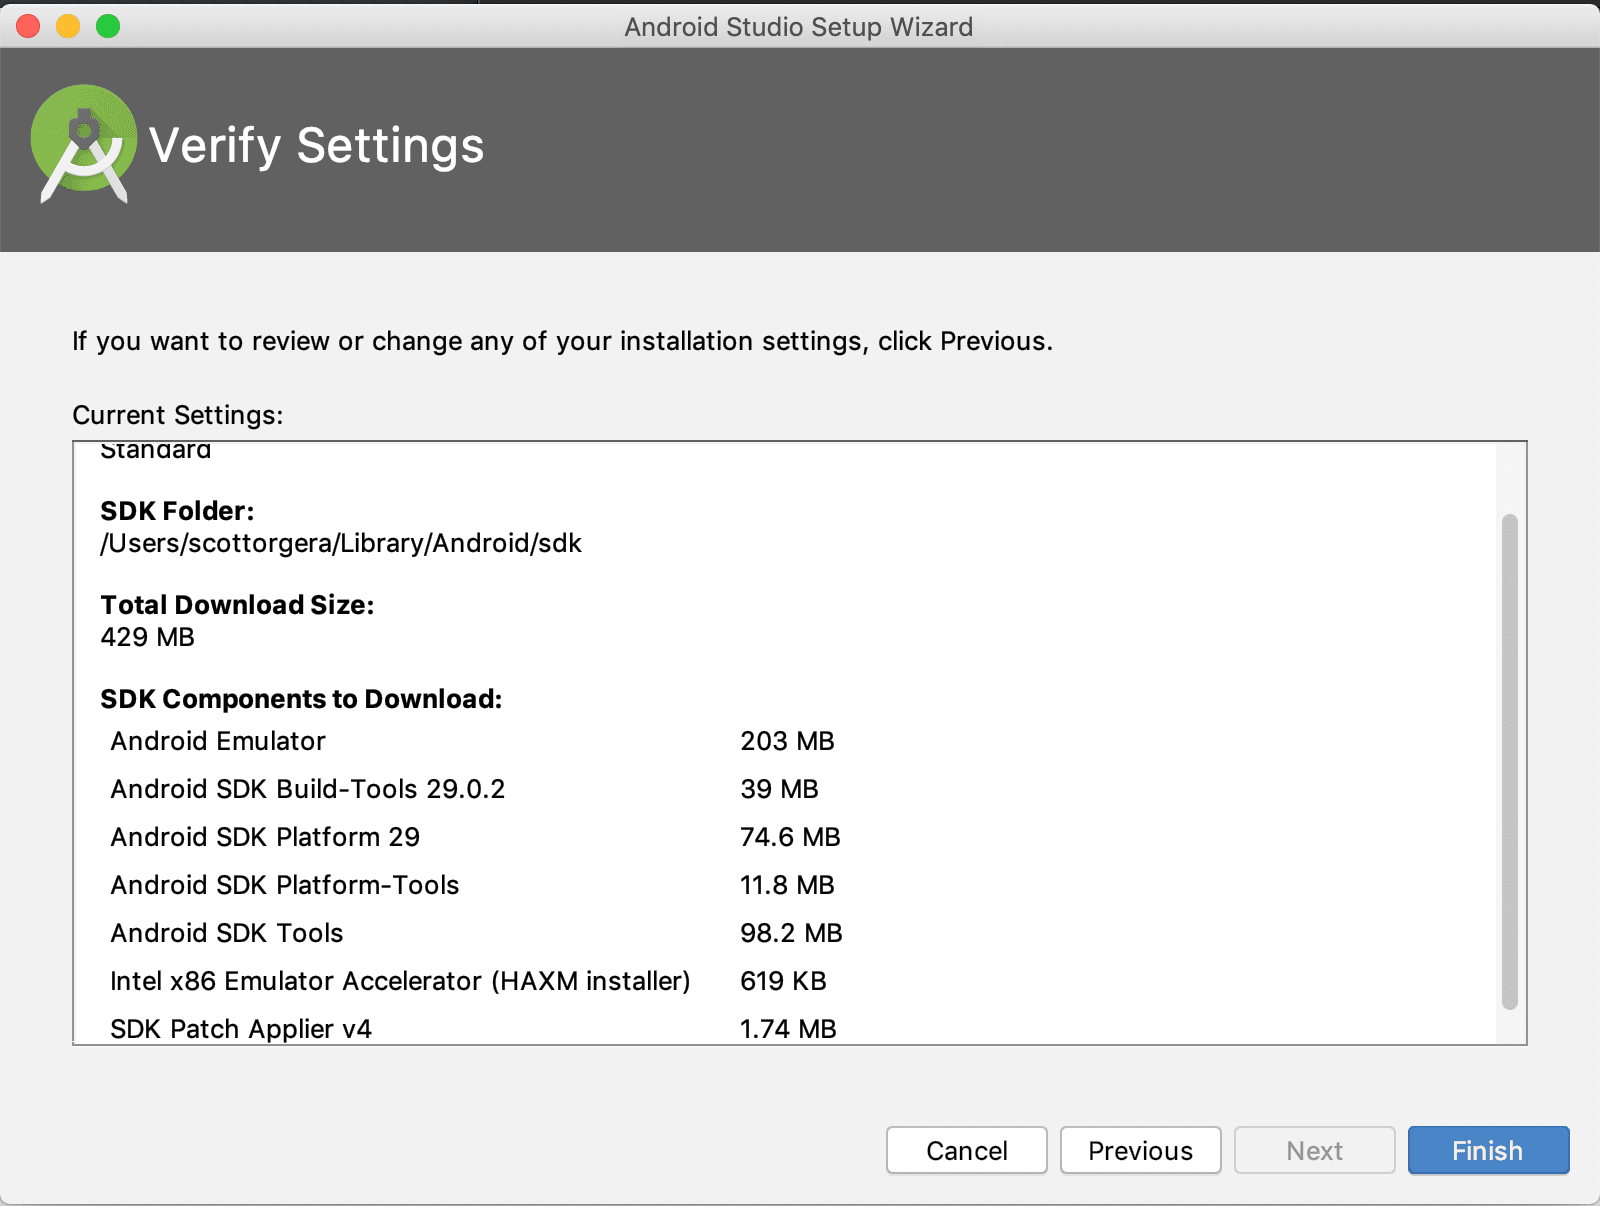 screenshot of Android Studio Verify Settings screen